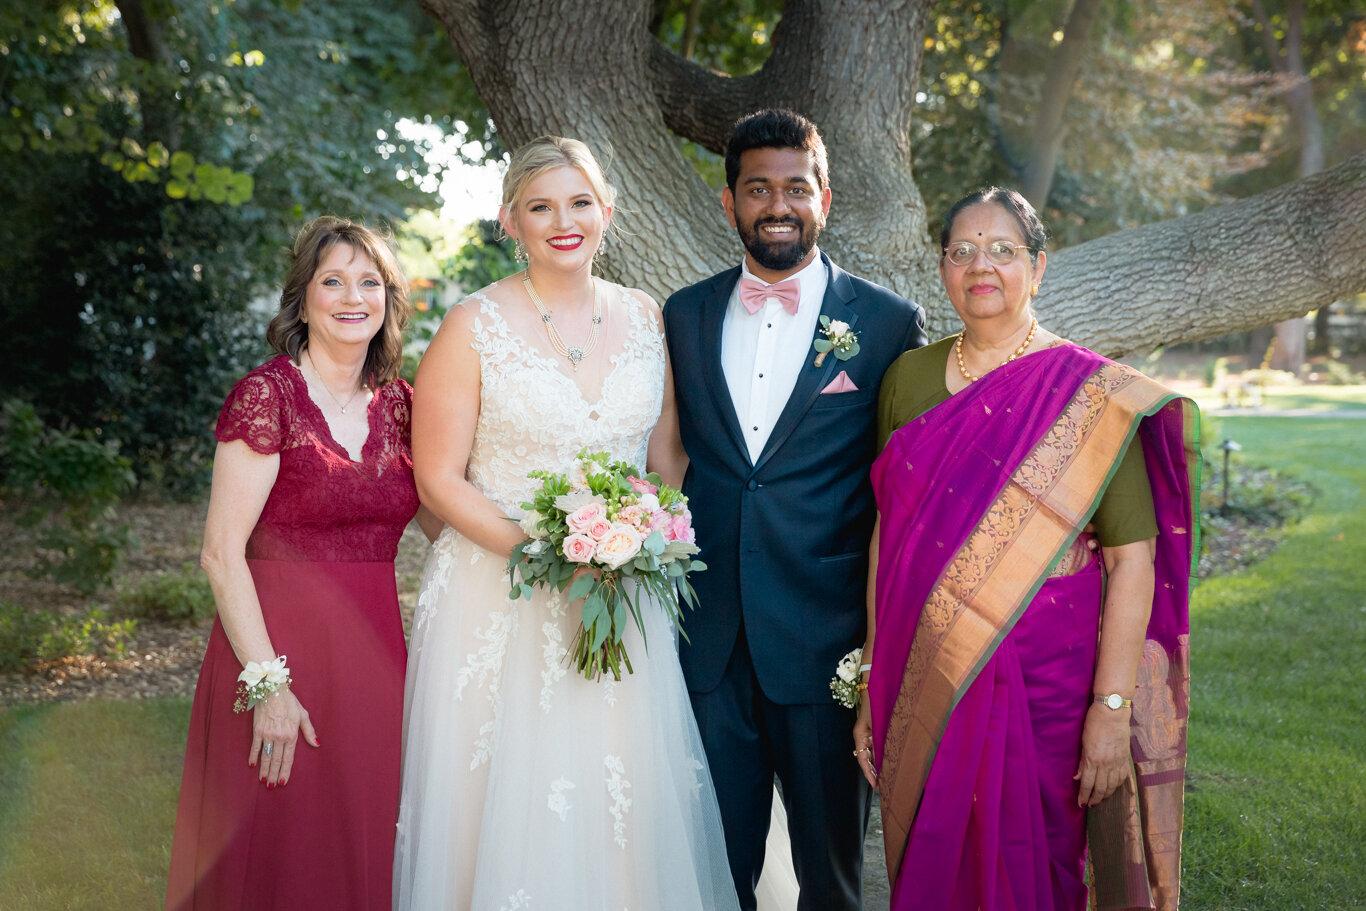 2019.08.24_Emily-Ashir-Wedding-at-the-Maples-6040.jpg